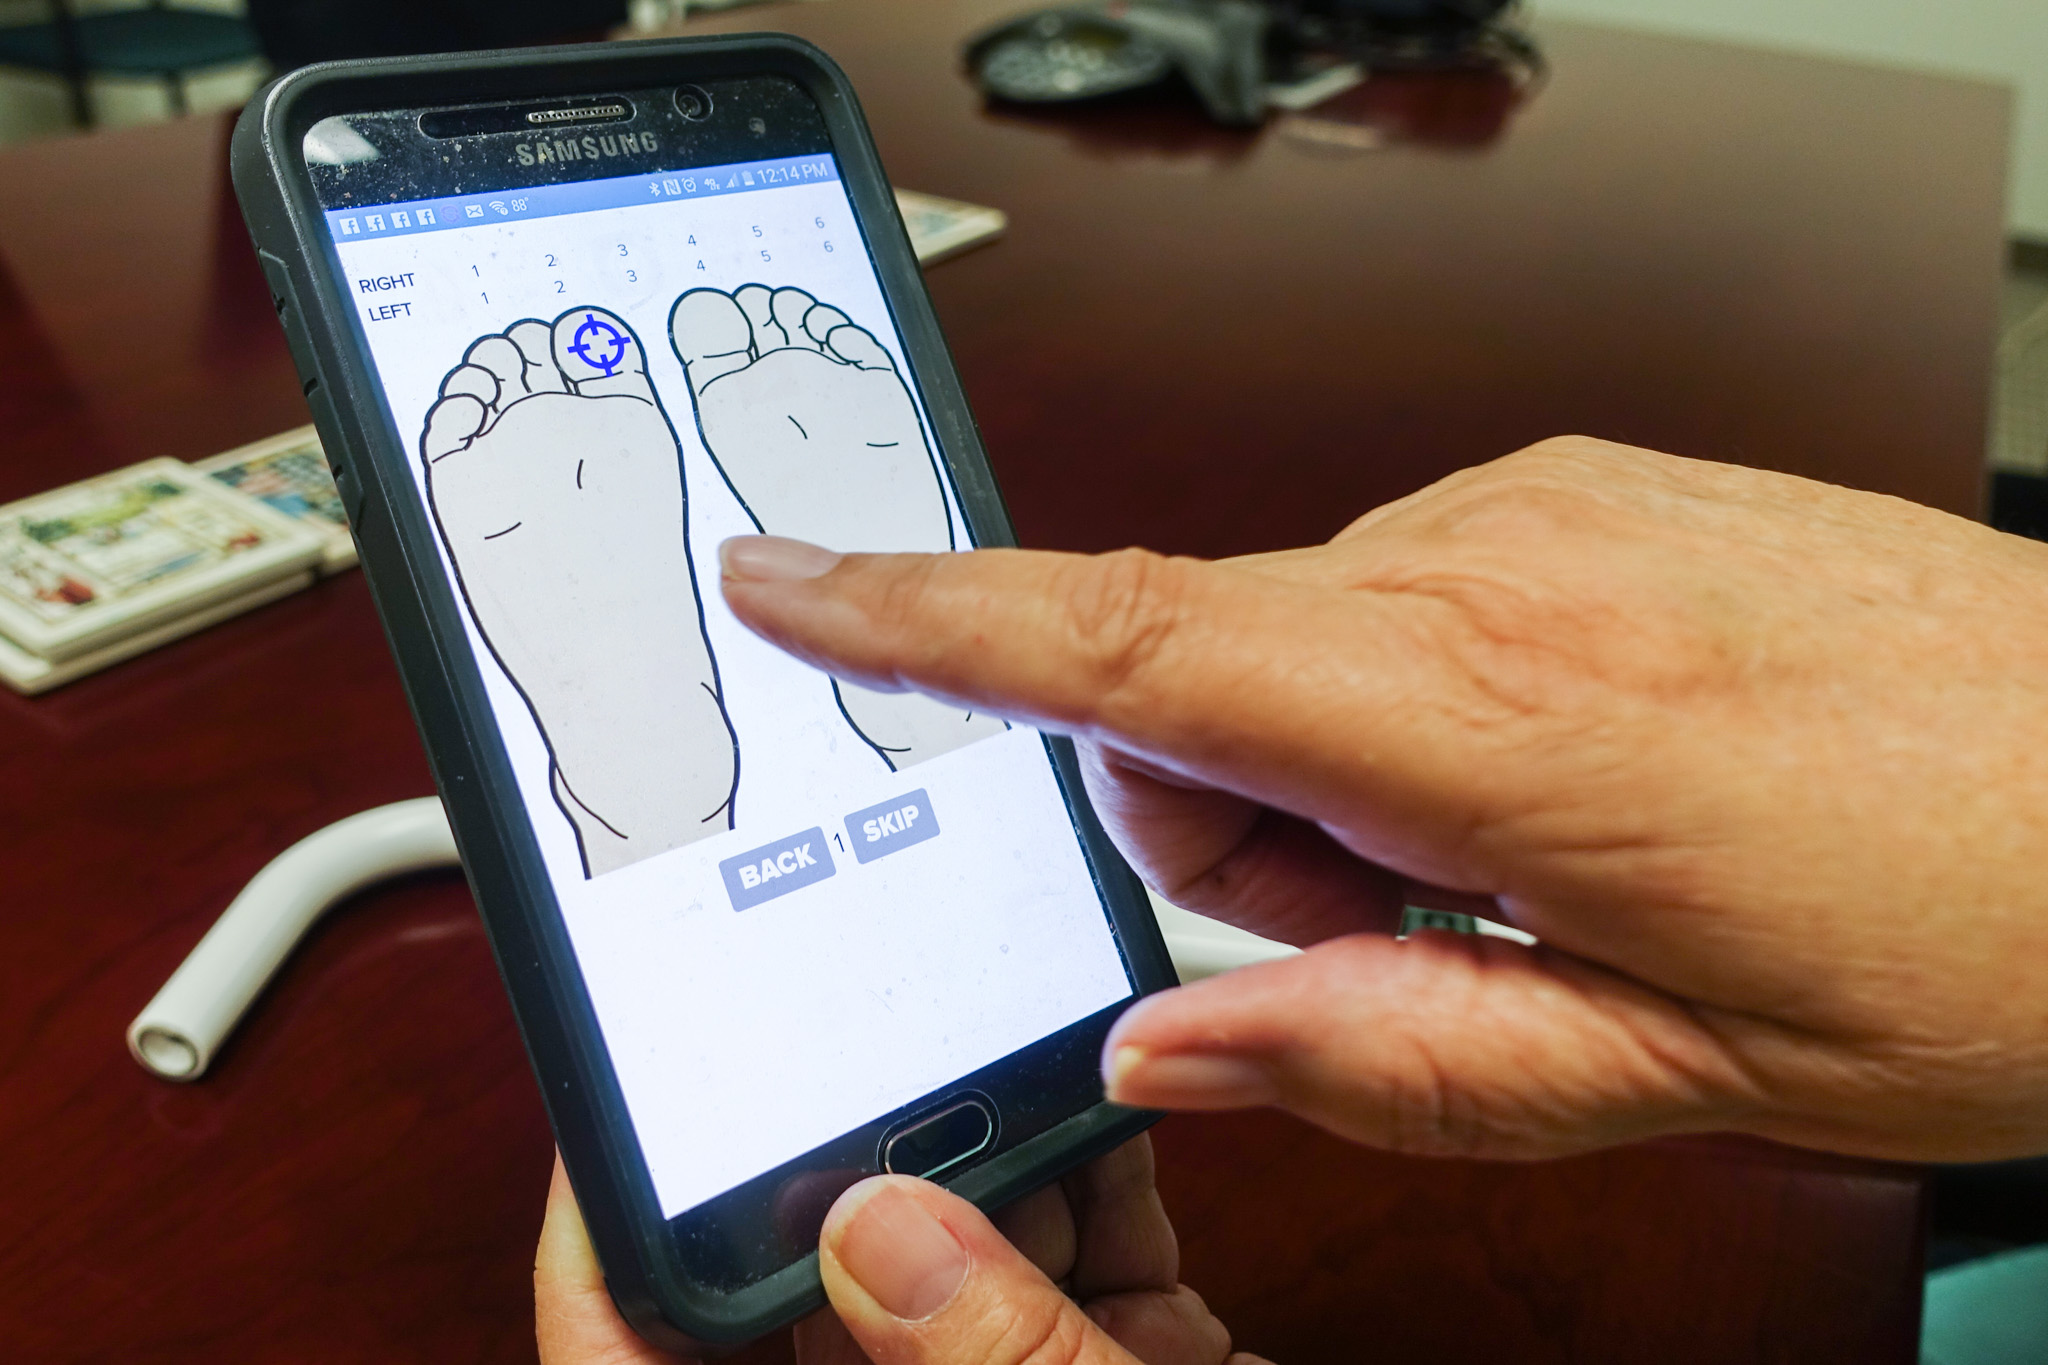 Roslyn McClendon demonstrates how to use the app for MR3 Health's diabetic foot sensor.